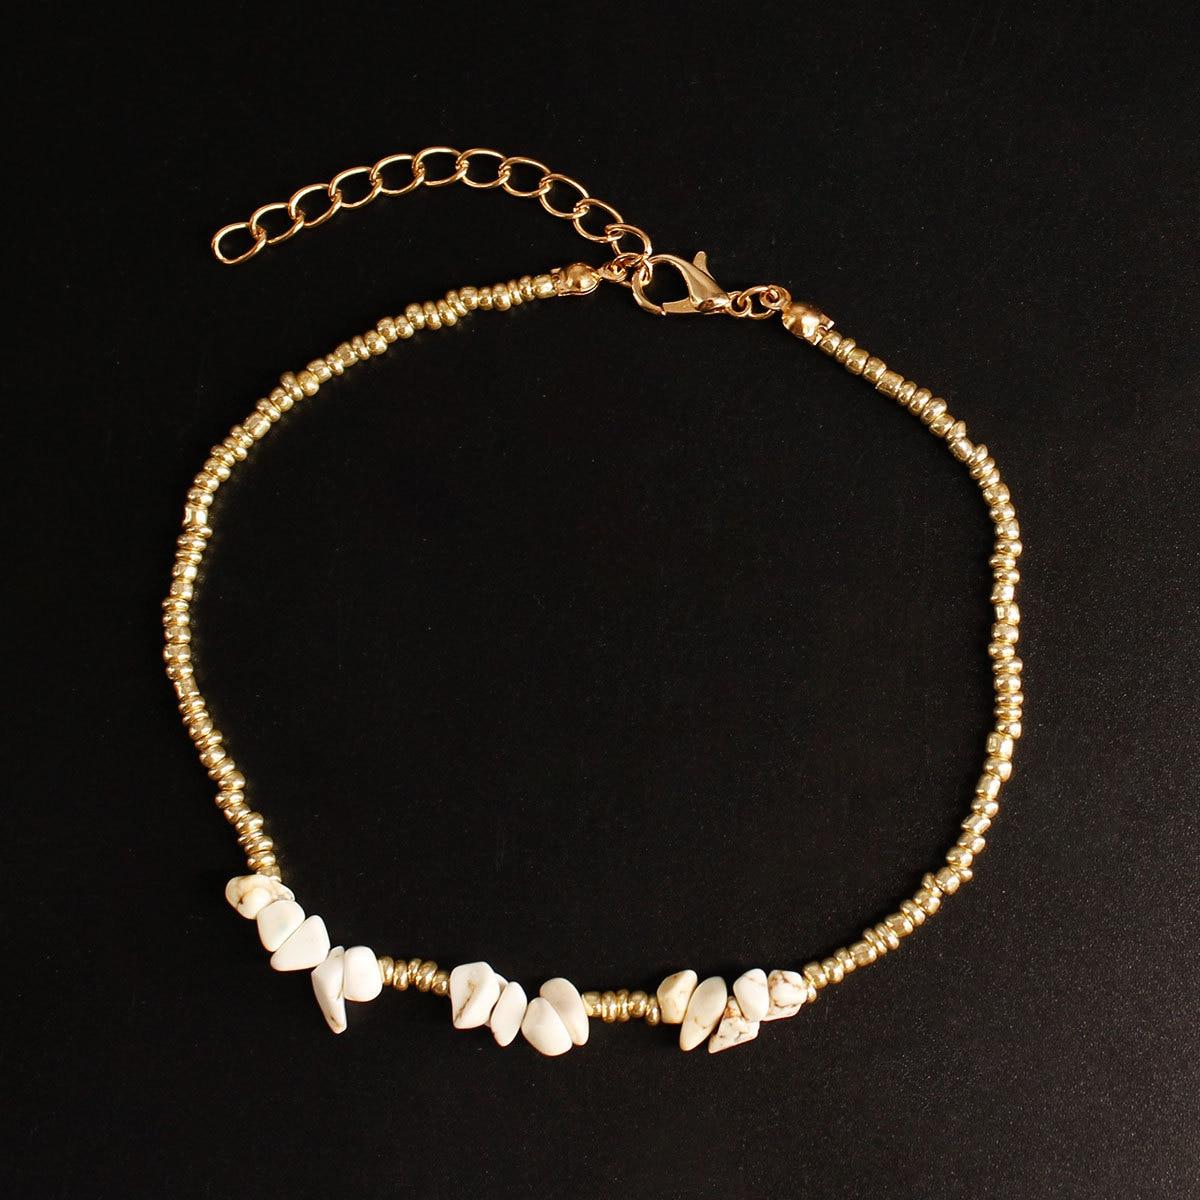 New Arrival Irregular White Stone Beads Anklet Beach Seed Beads Handmade Anklet Bracelets Leg Foot Jewelry For Women Gifts K253